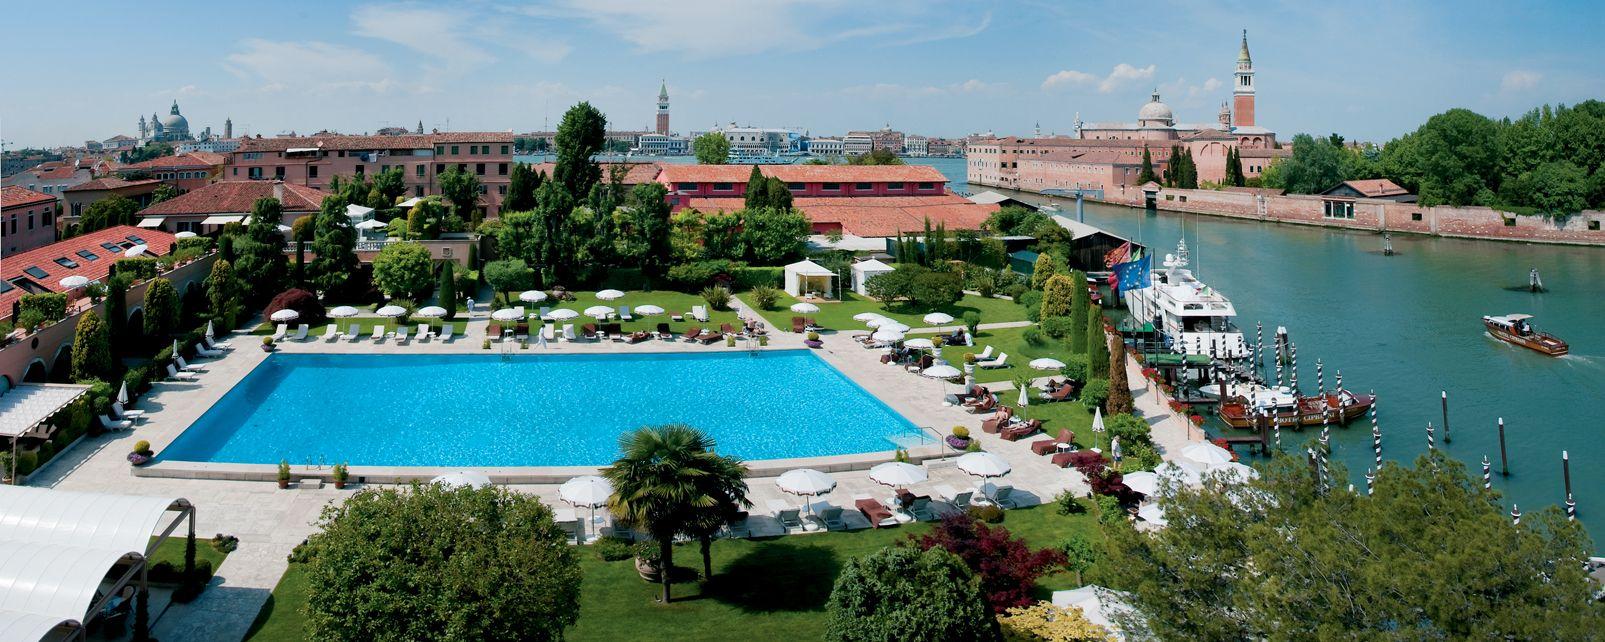 Hôtel Belmond Cipriani